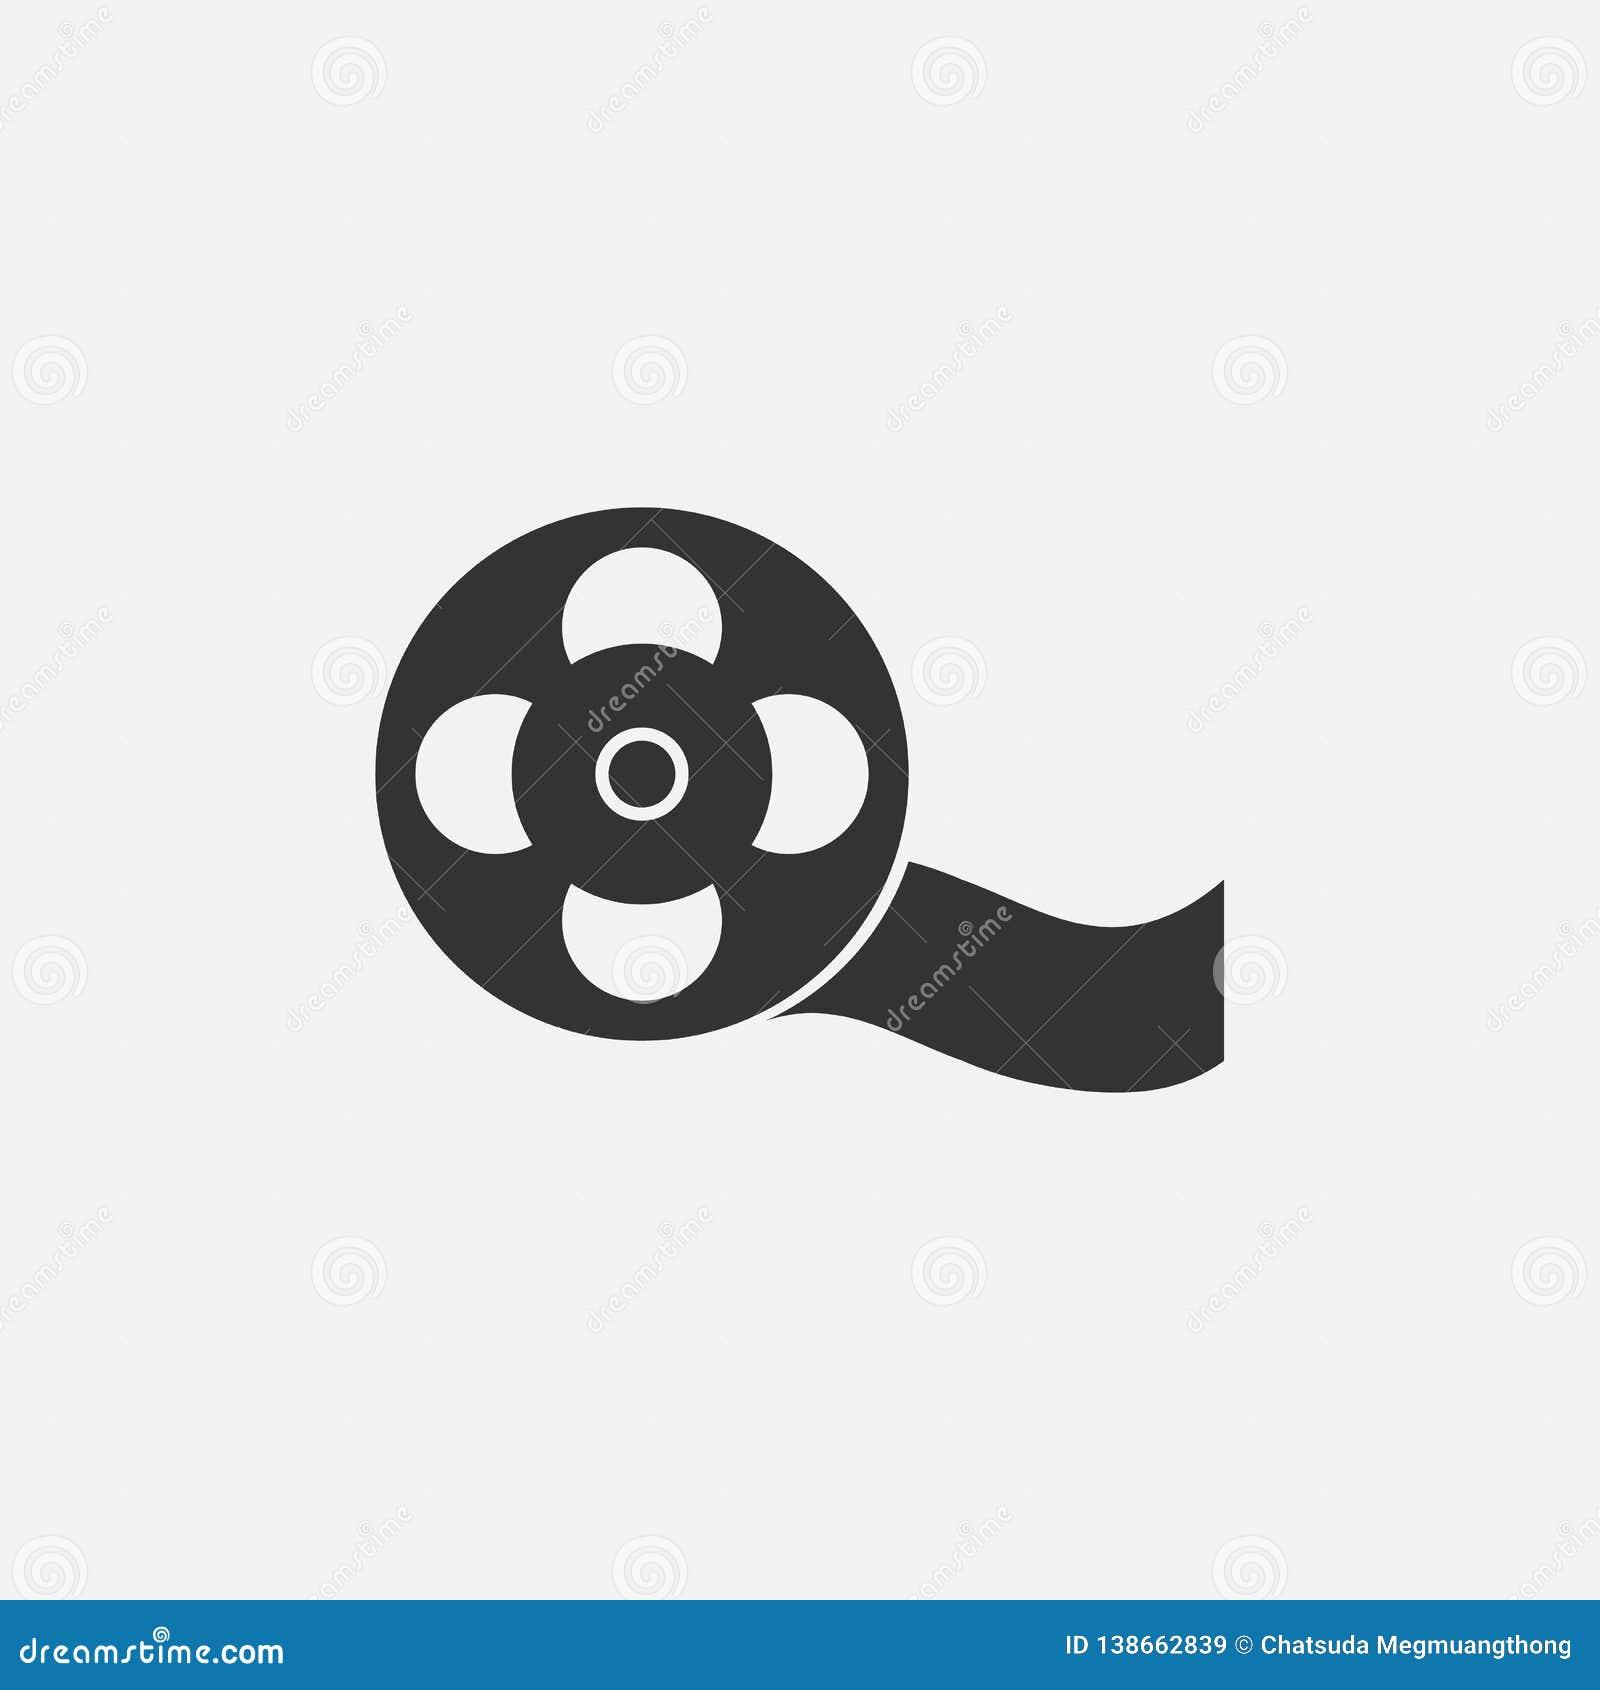 Film reel icon, film, reel, cinema, movie